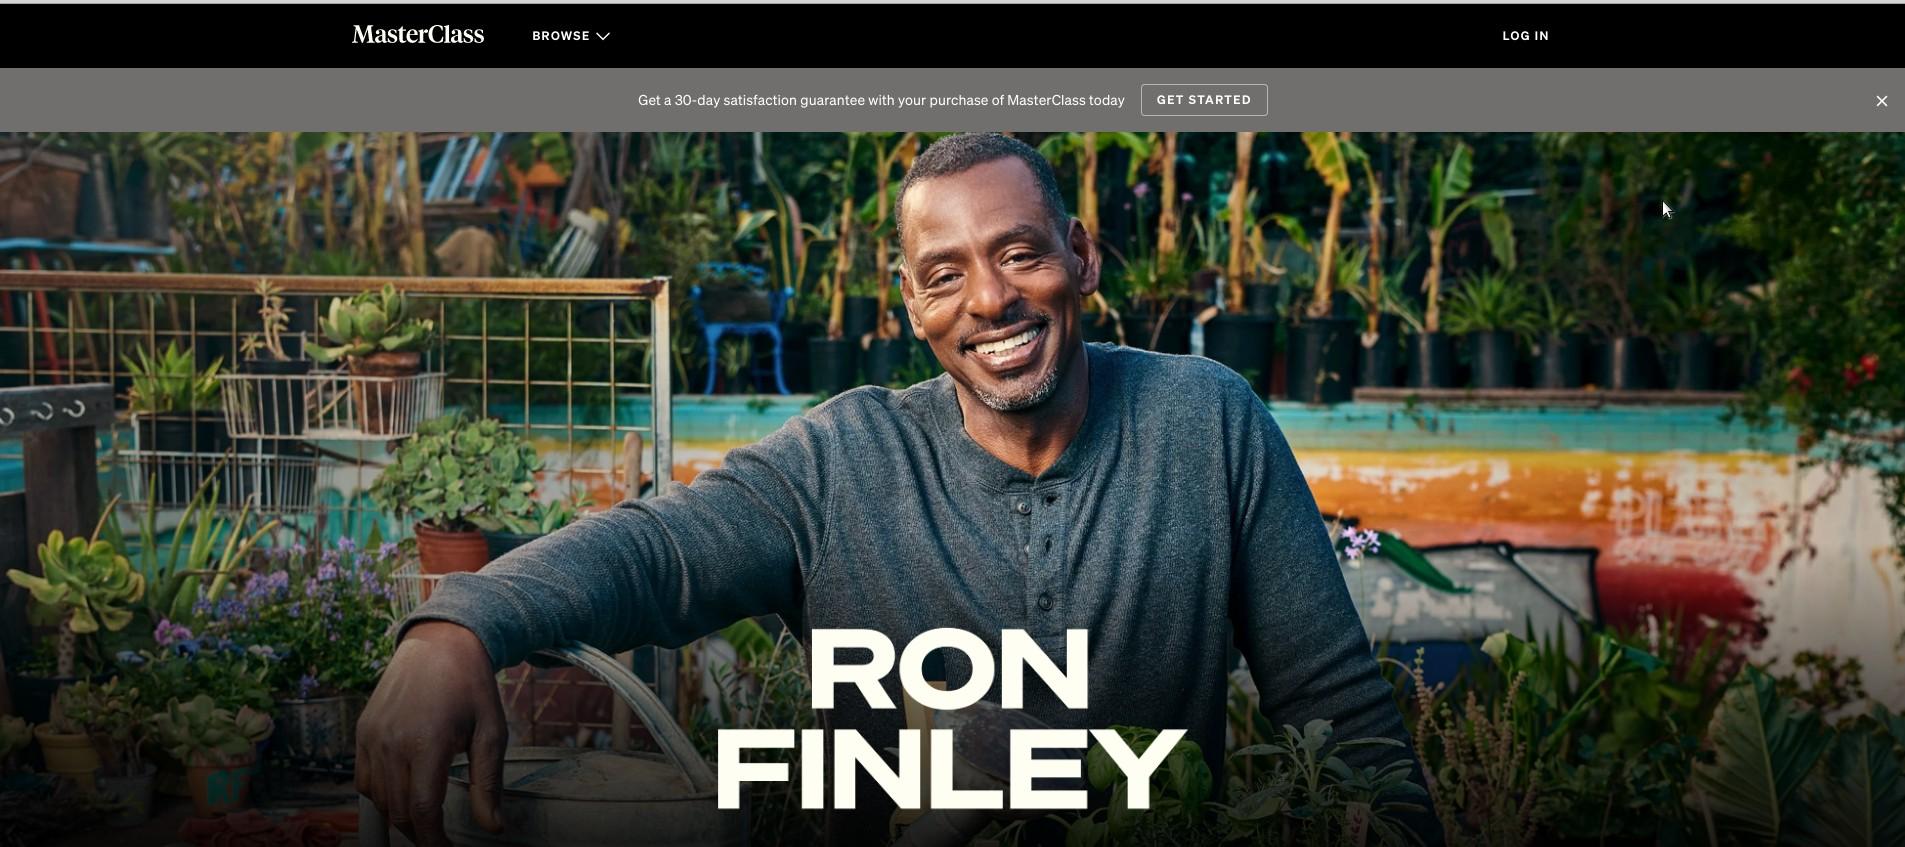 Ron Finley Masterclass Review